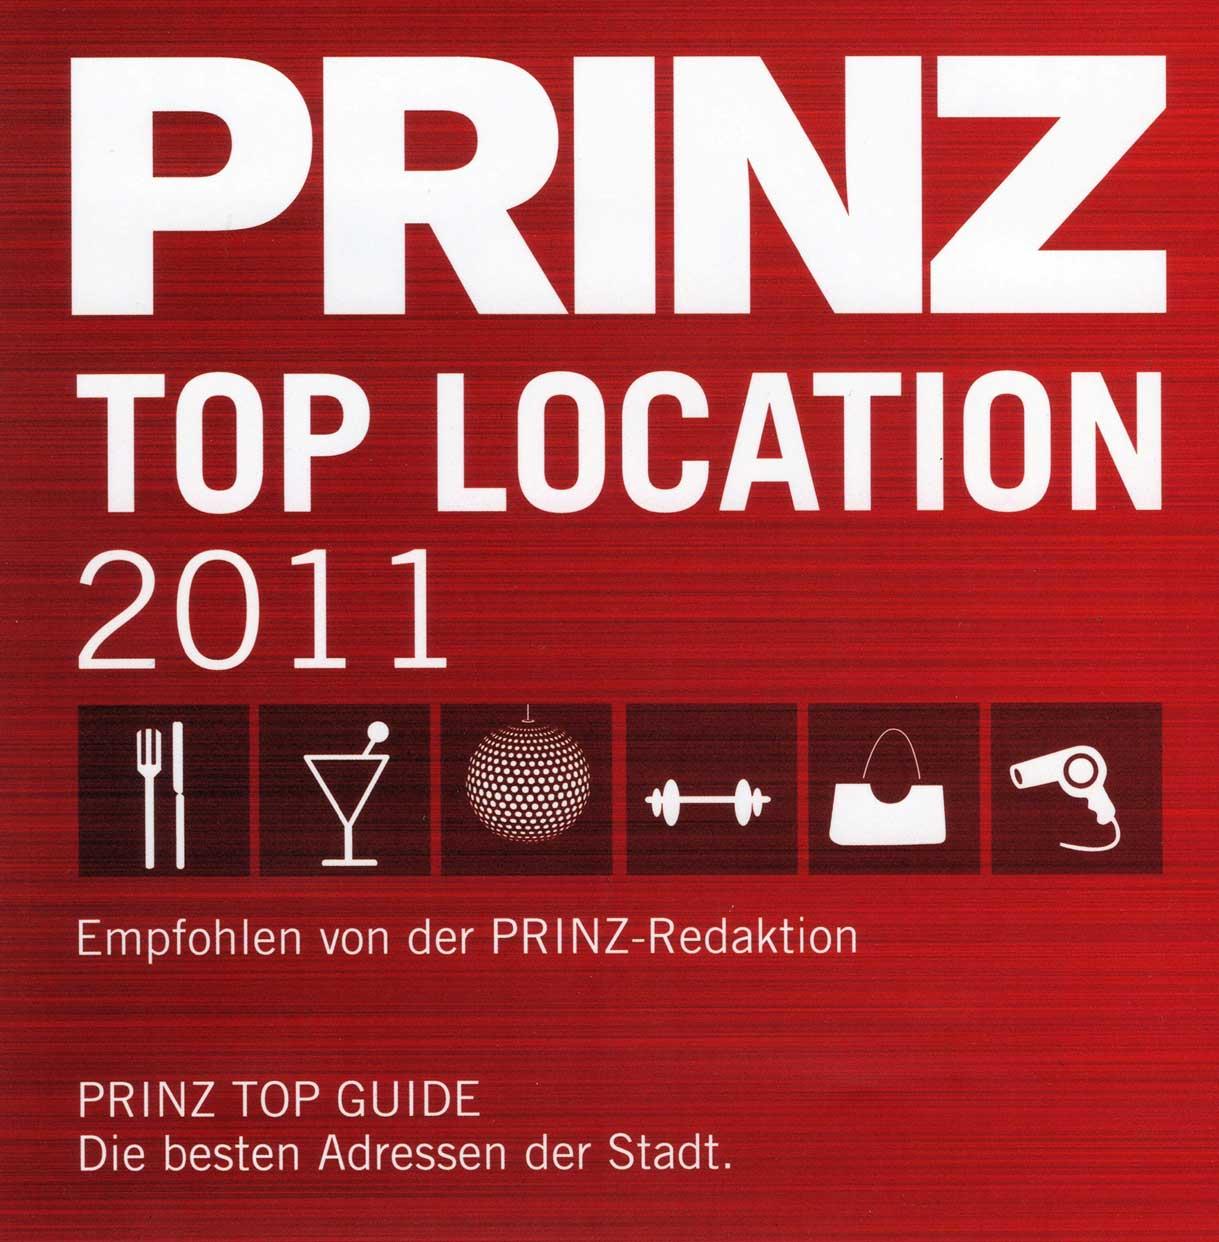 Prinz Top Location 2011